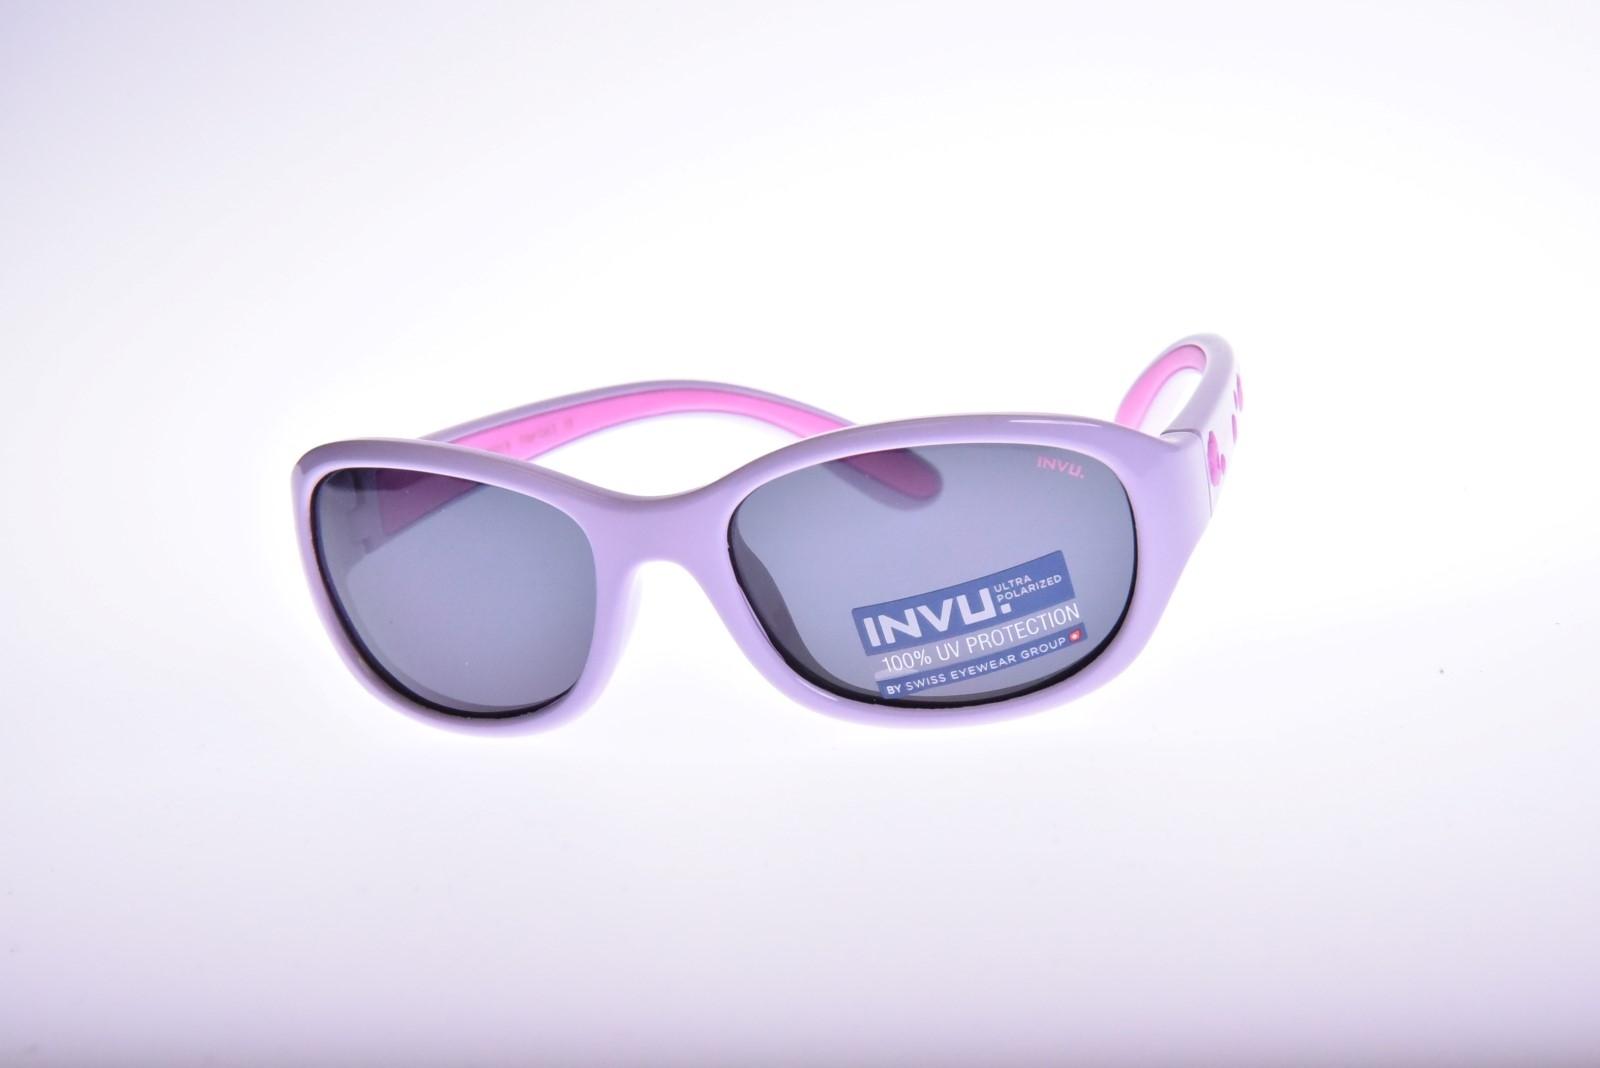 INVU. Kids K2501B - Slnečné okuliare pre deti 1-3 r.